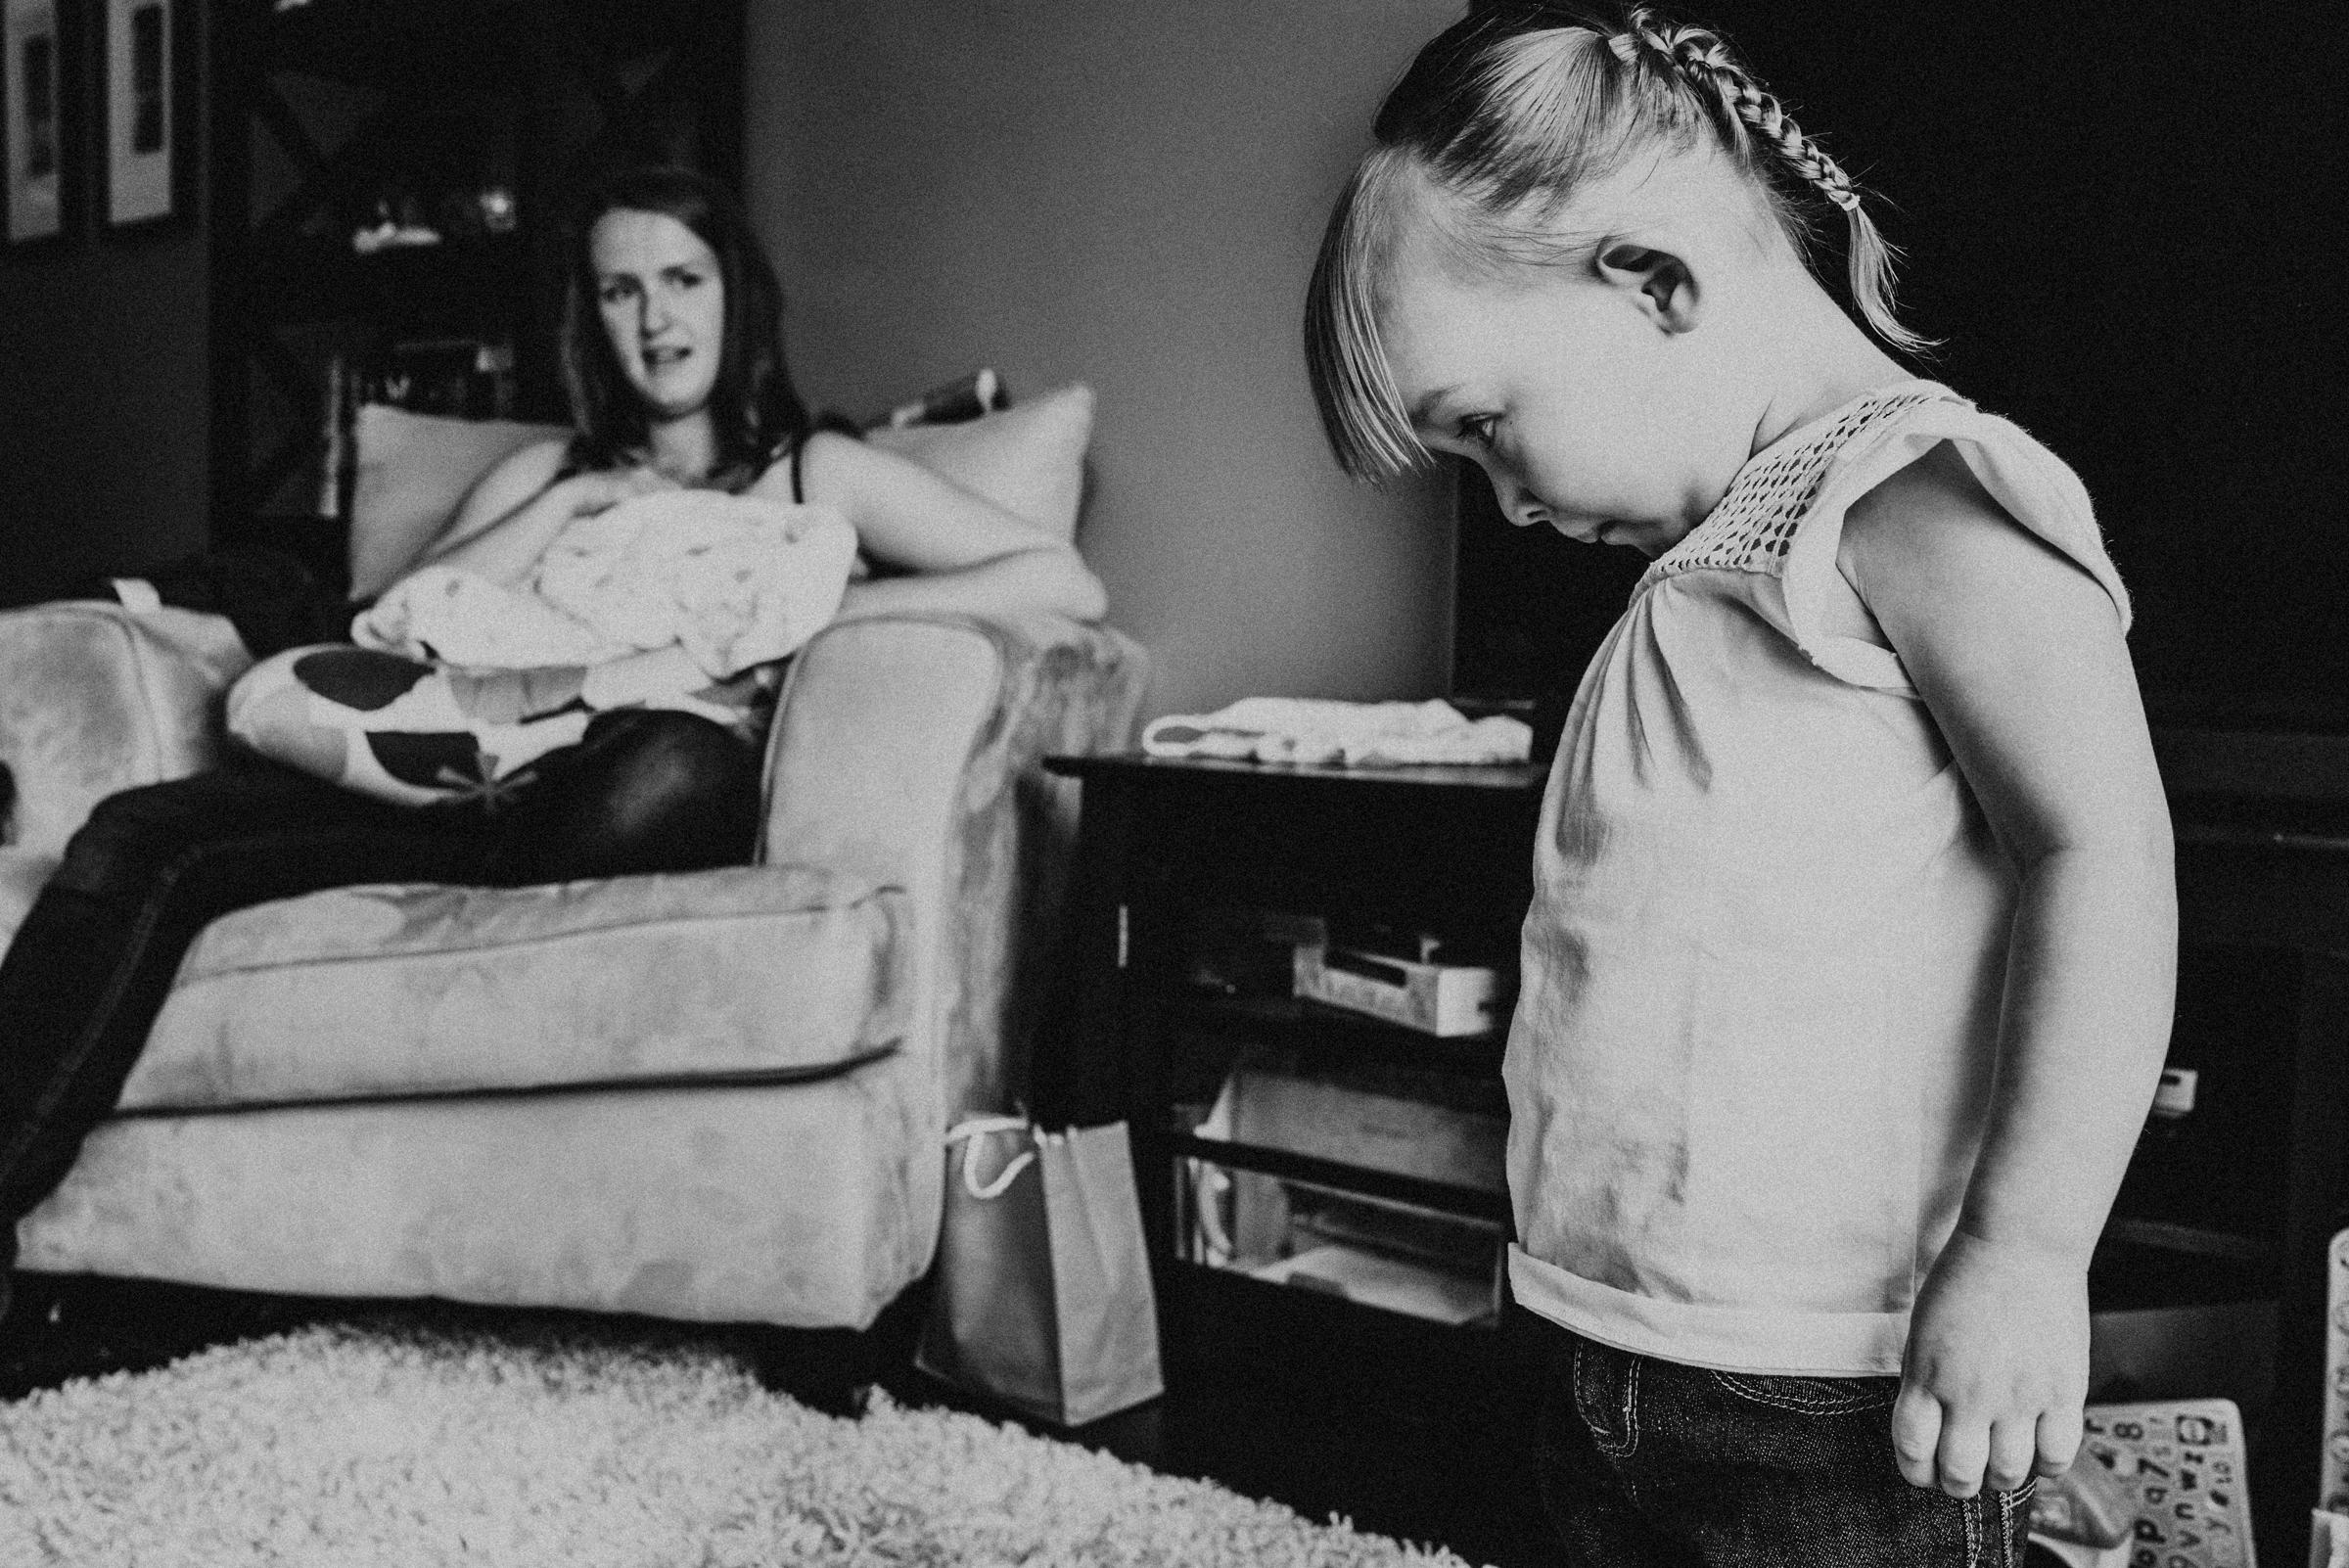 Nicola_Reiersen_Photography_Victoria_BC_Family_Photographer-54.jpg